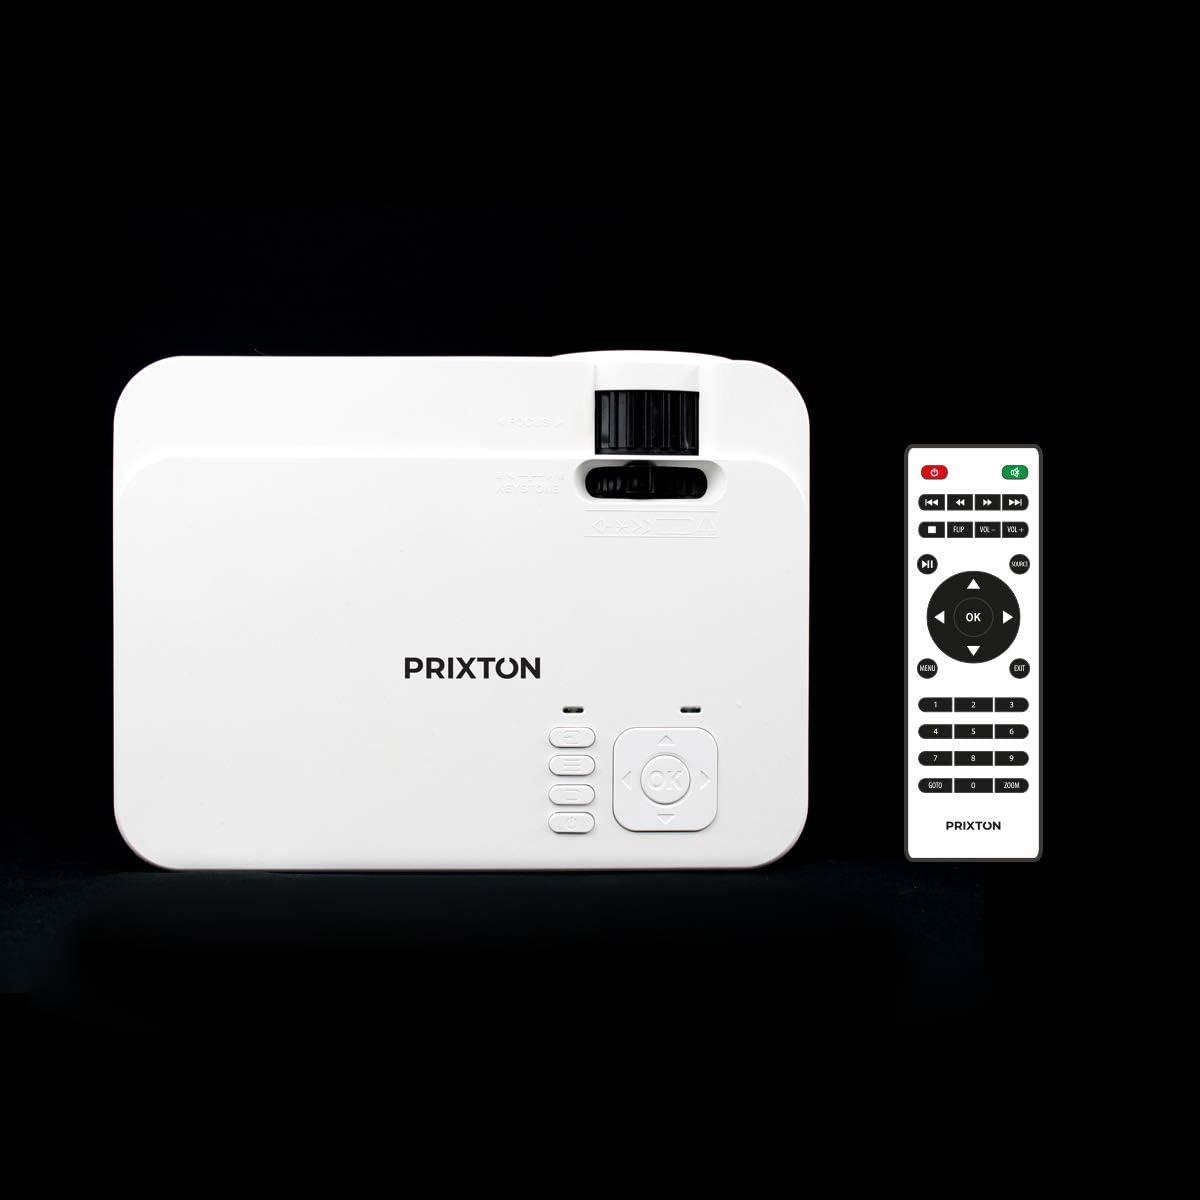 PRIXTON Goya P20 - Mini Proyector Portatil / Proyector Cine en ...